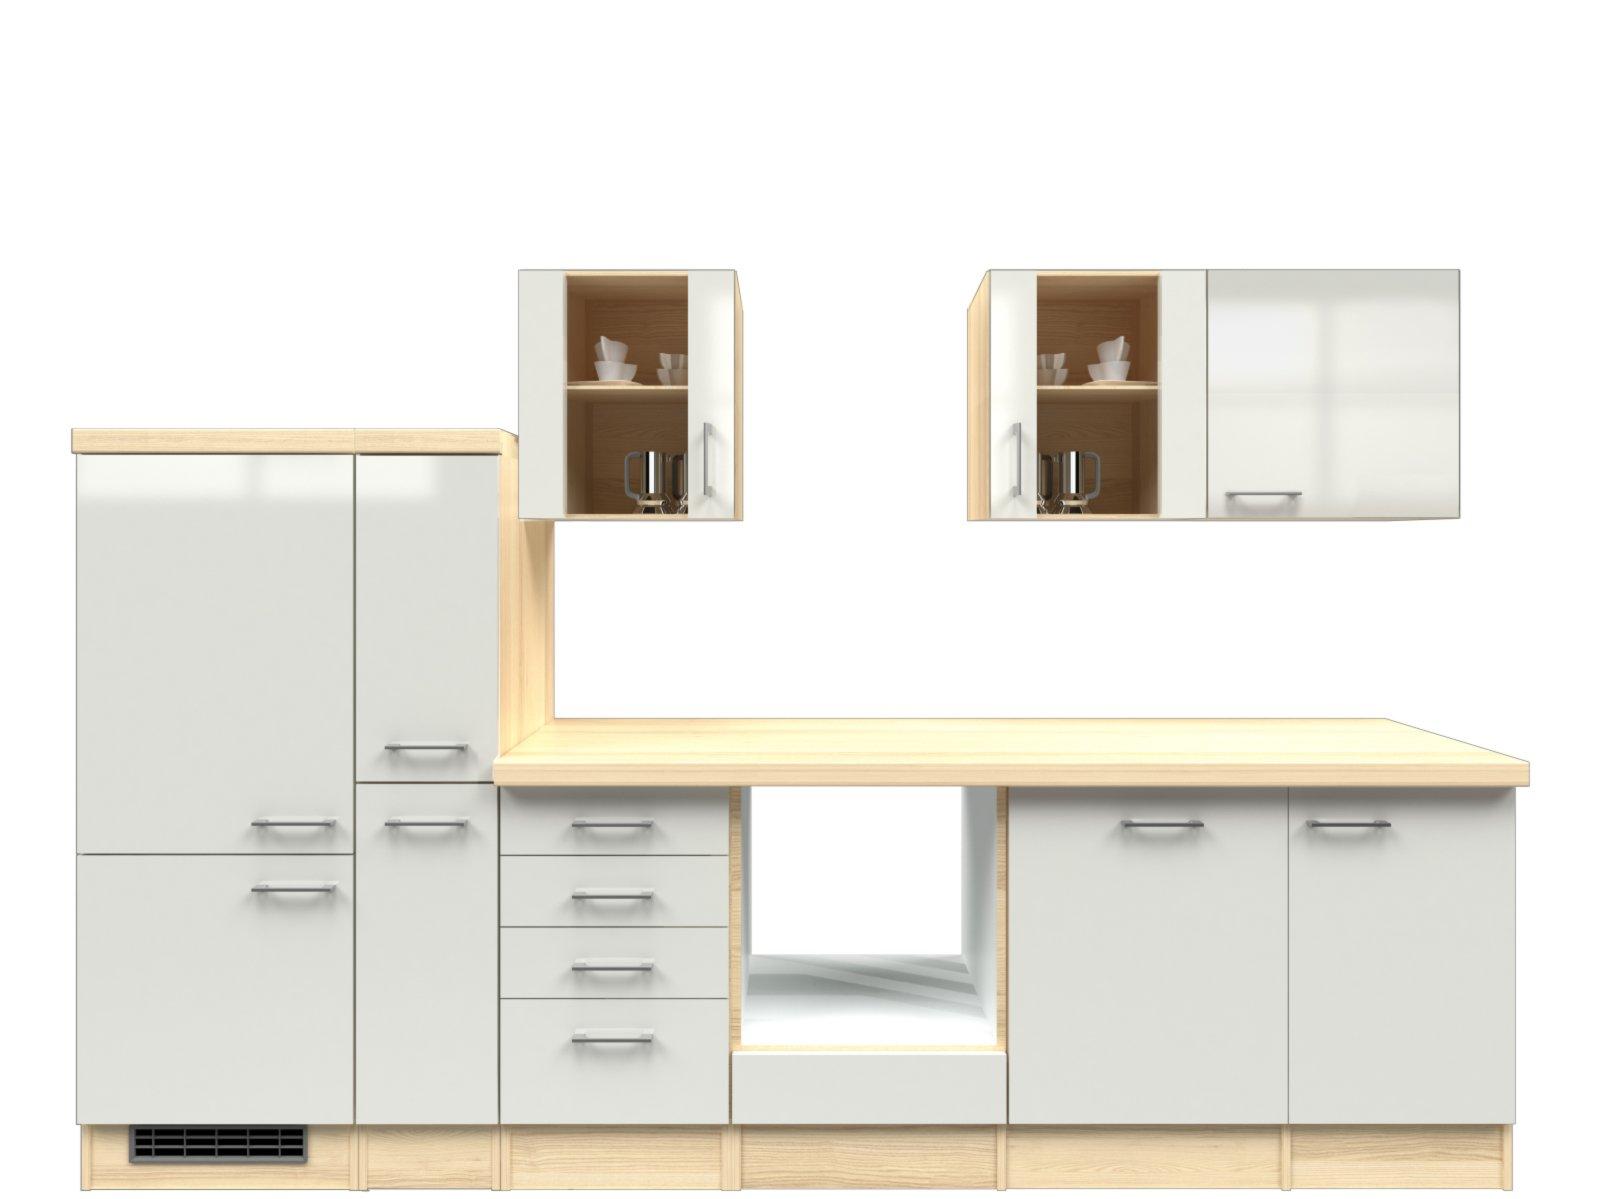 k chenblock abaco perlmutt akazie 310 cm k chenzeilen ohne e ger te k chenzeilen m bel. Black Bedroom Furniture Sets. Home Design Ideas